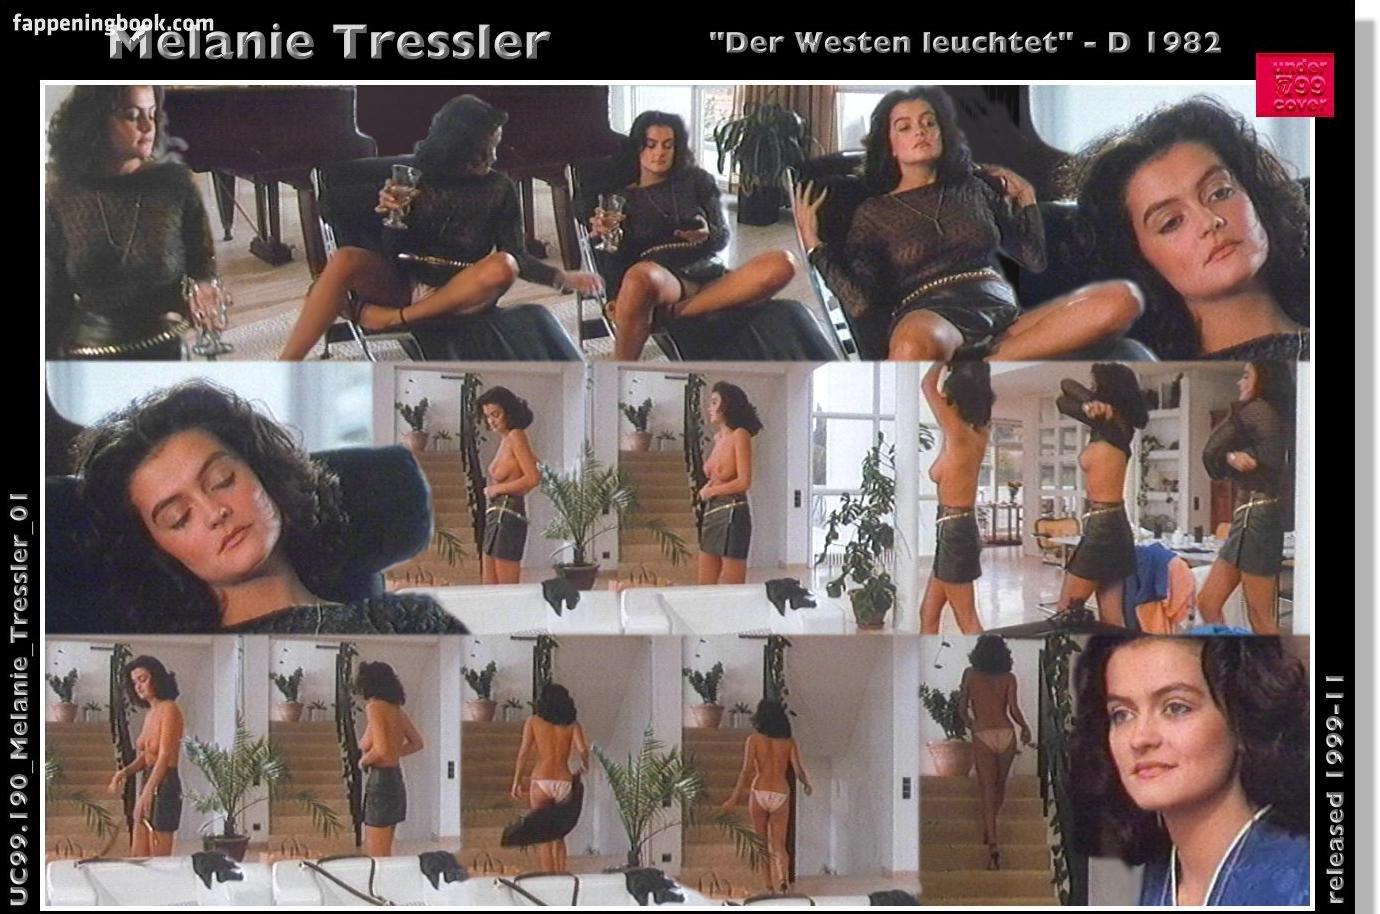 Melanie Tressler Nude